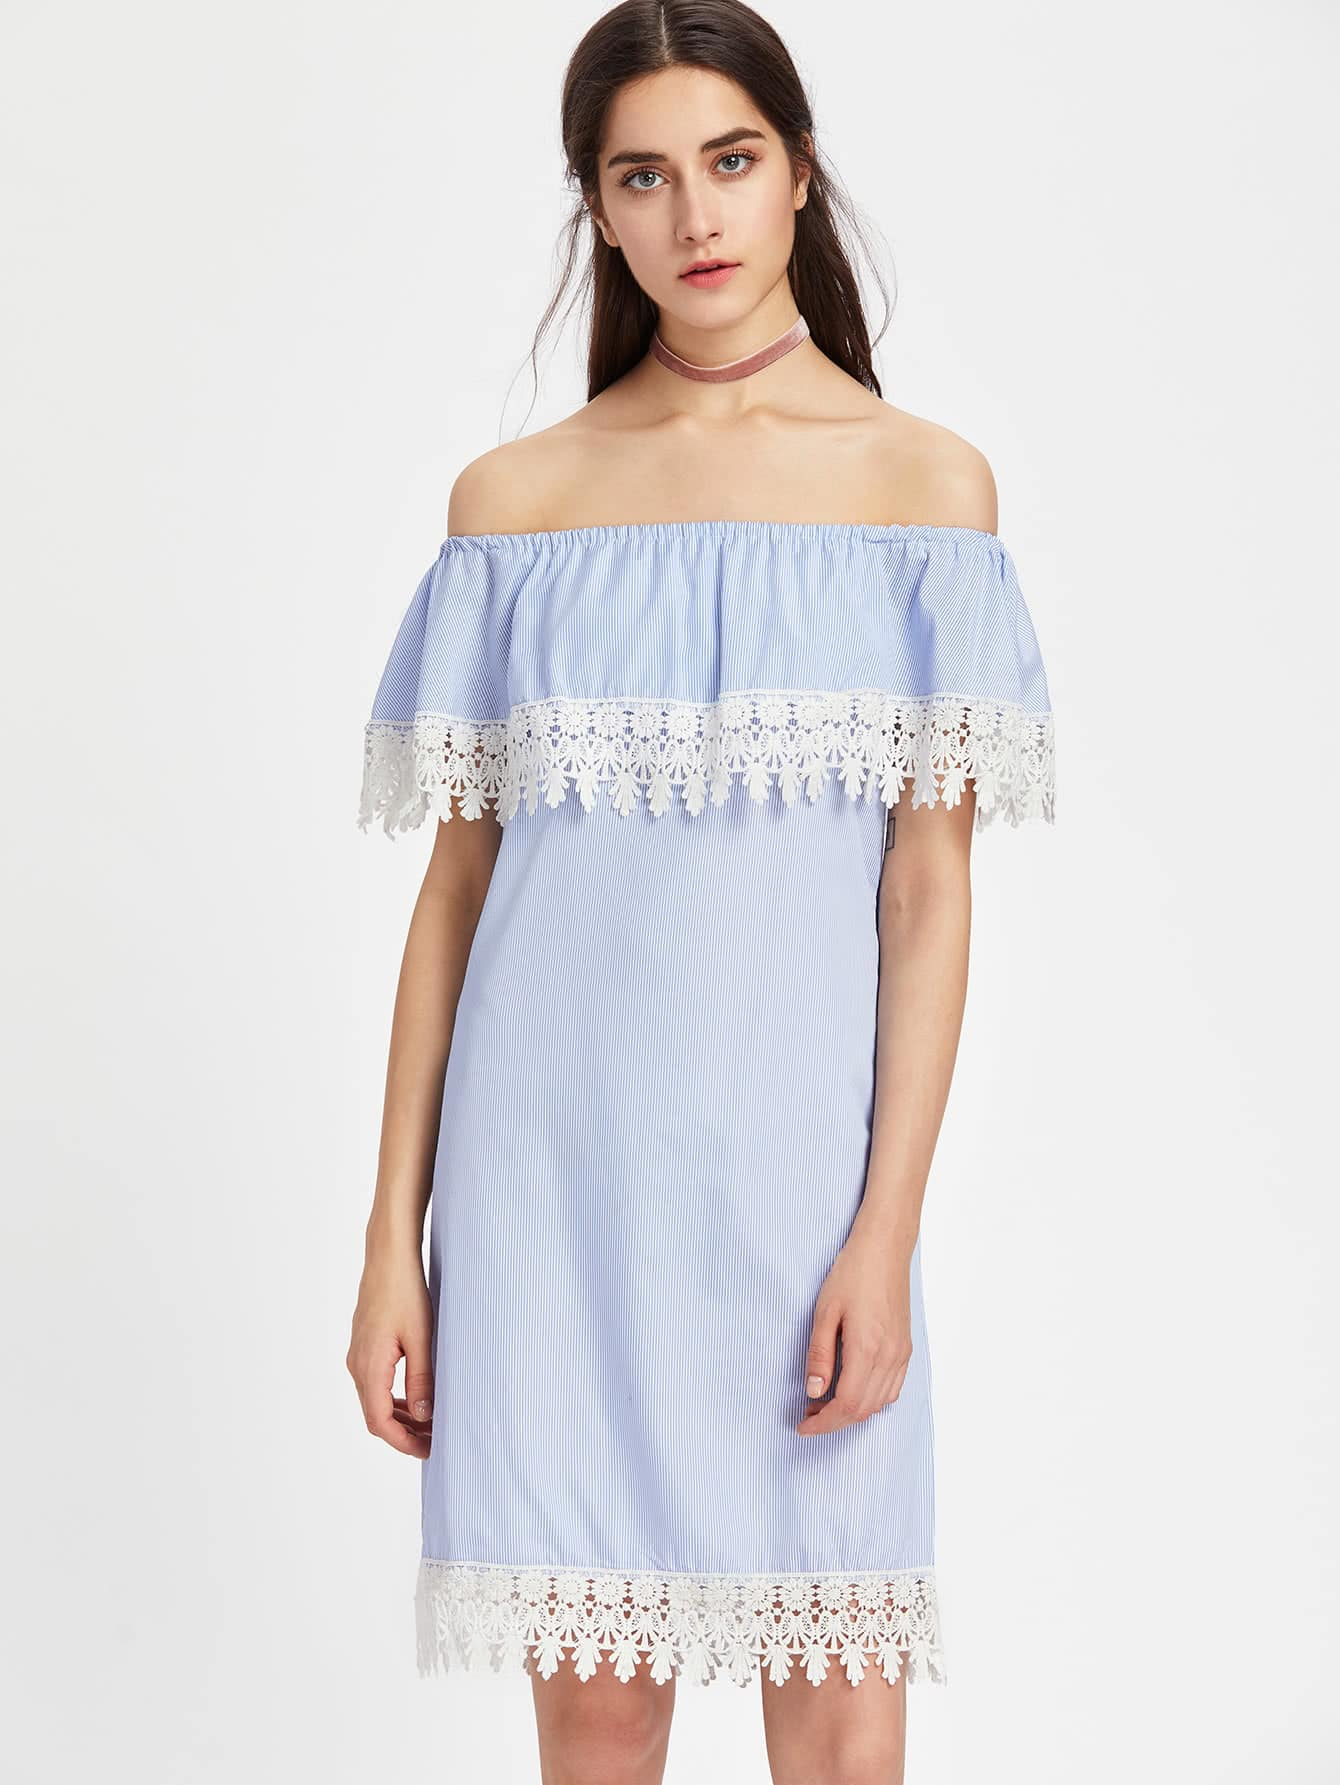 Flounce Layered Neckline Contrast Lace Trim Vertical Striped Dress maison jules new junior s small s pink combo lace crepe contrast trim dress $89